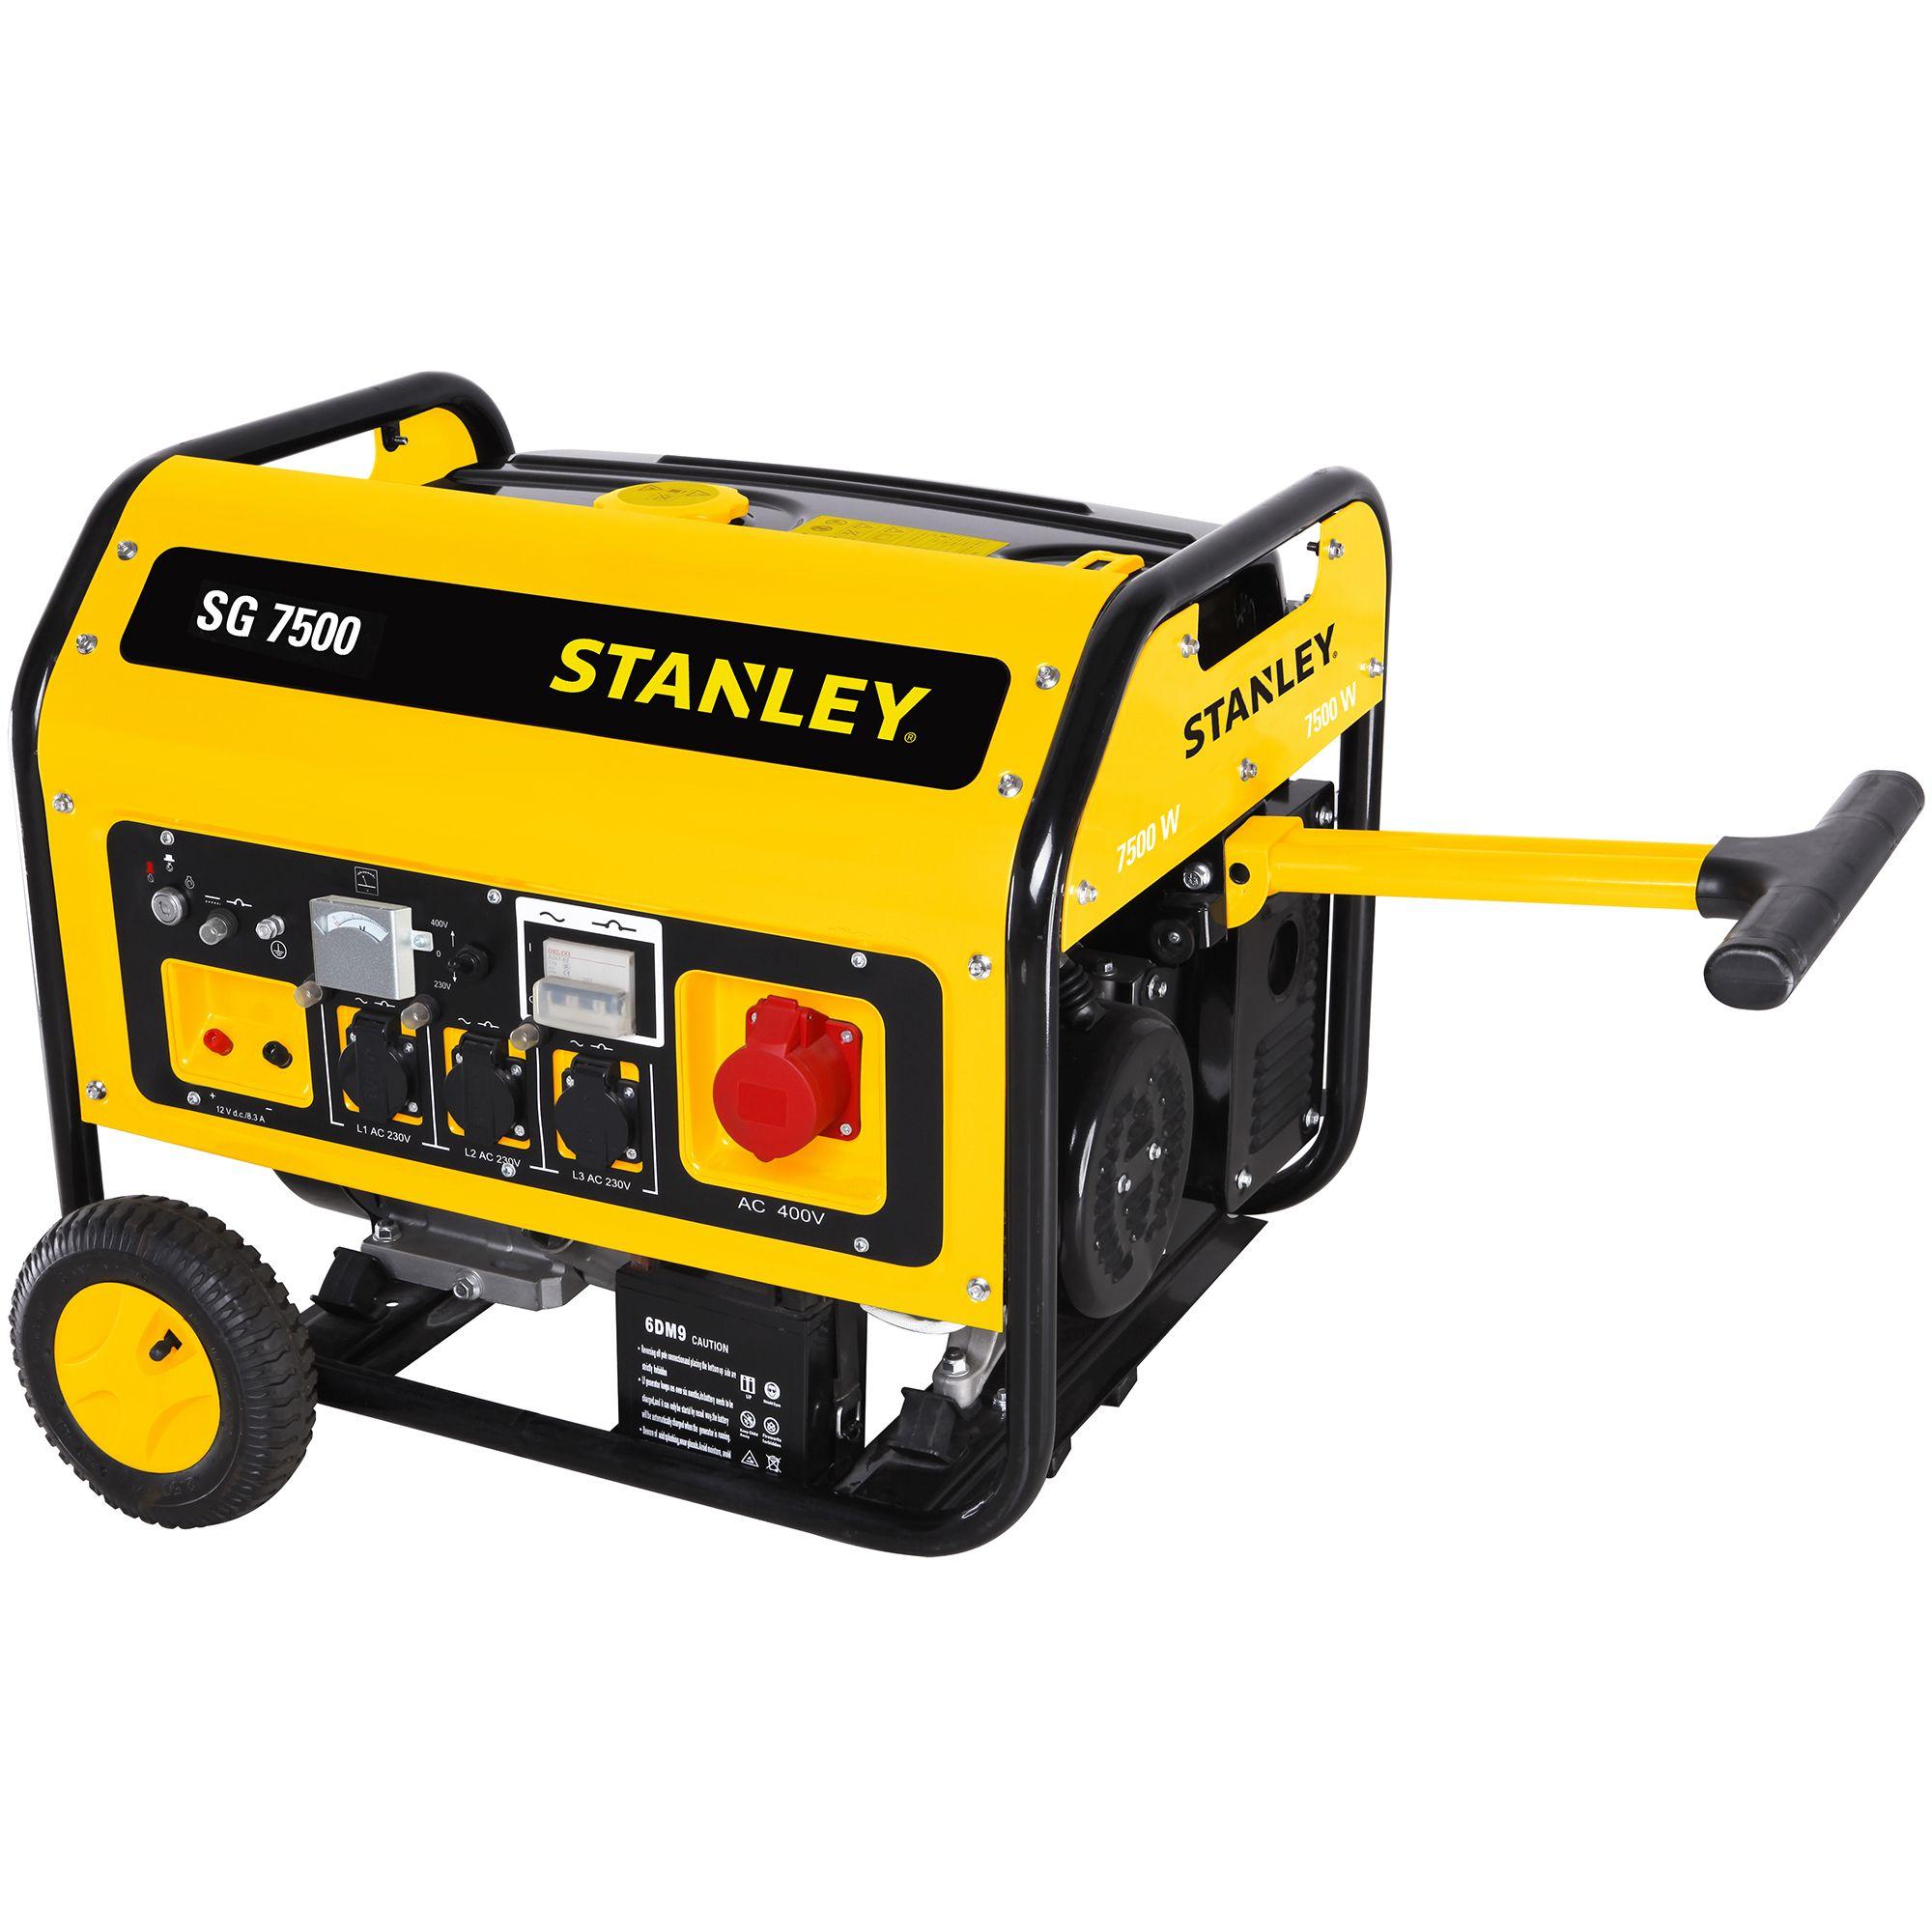 Fotografie Generator curent electric Stanley SG7500B, 7500 W, AVR, 230 V, 4 timpi, 25 l, benzina, autonomie 6.3 h